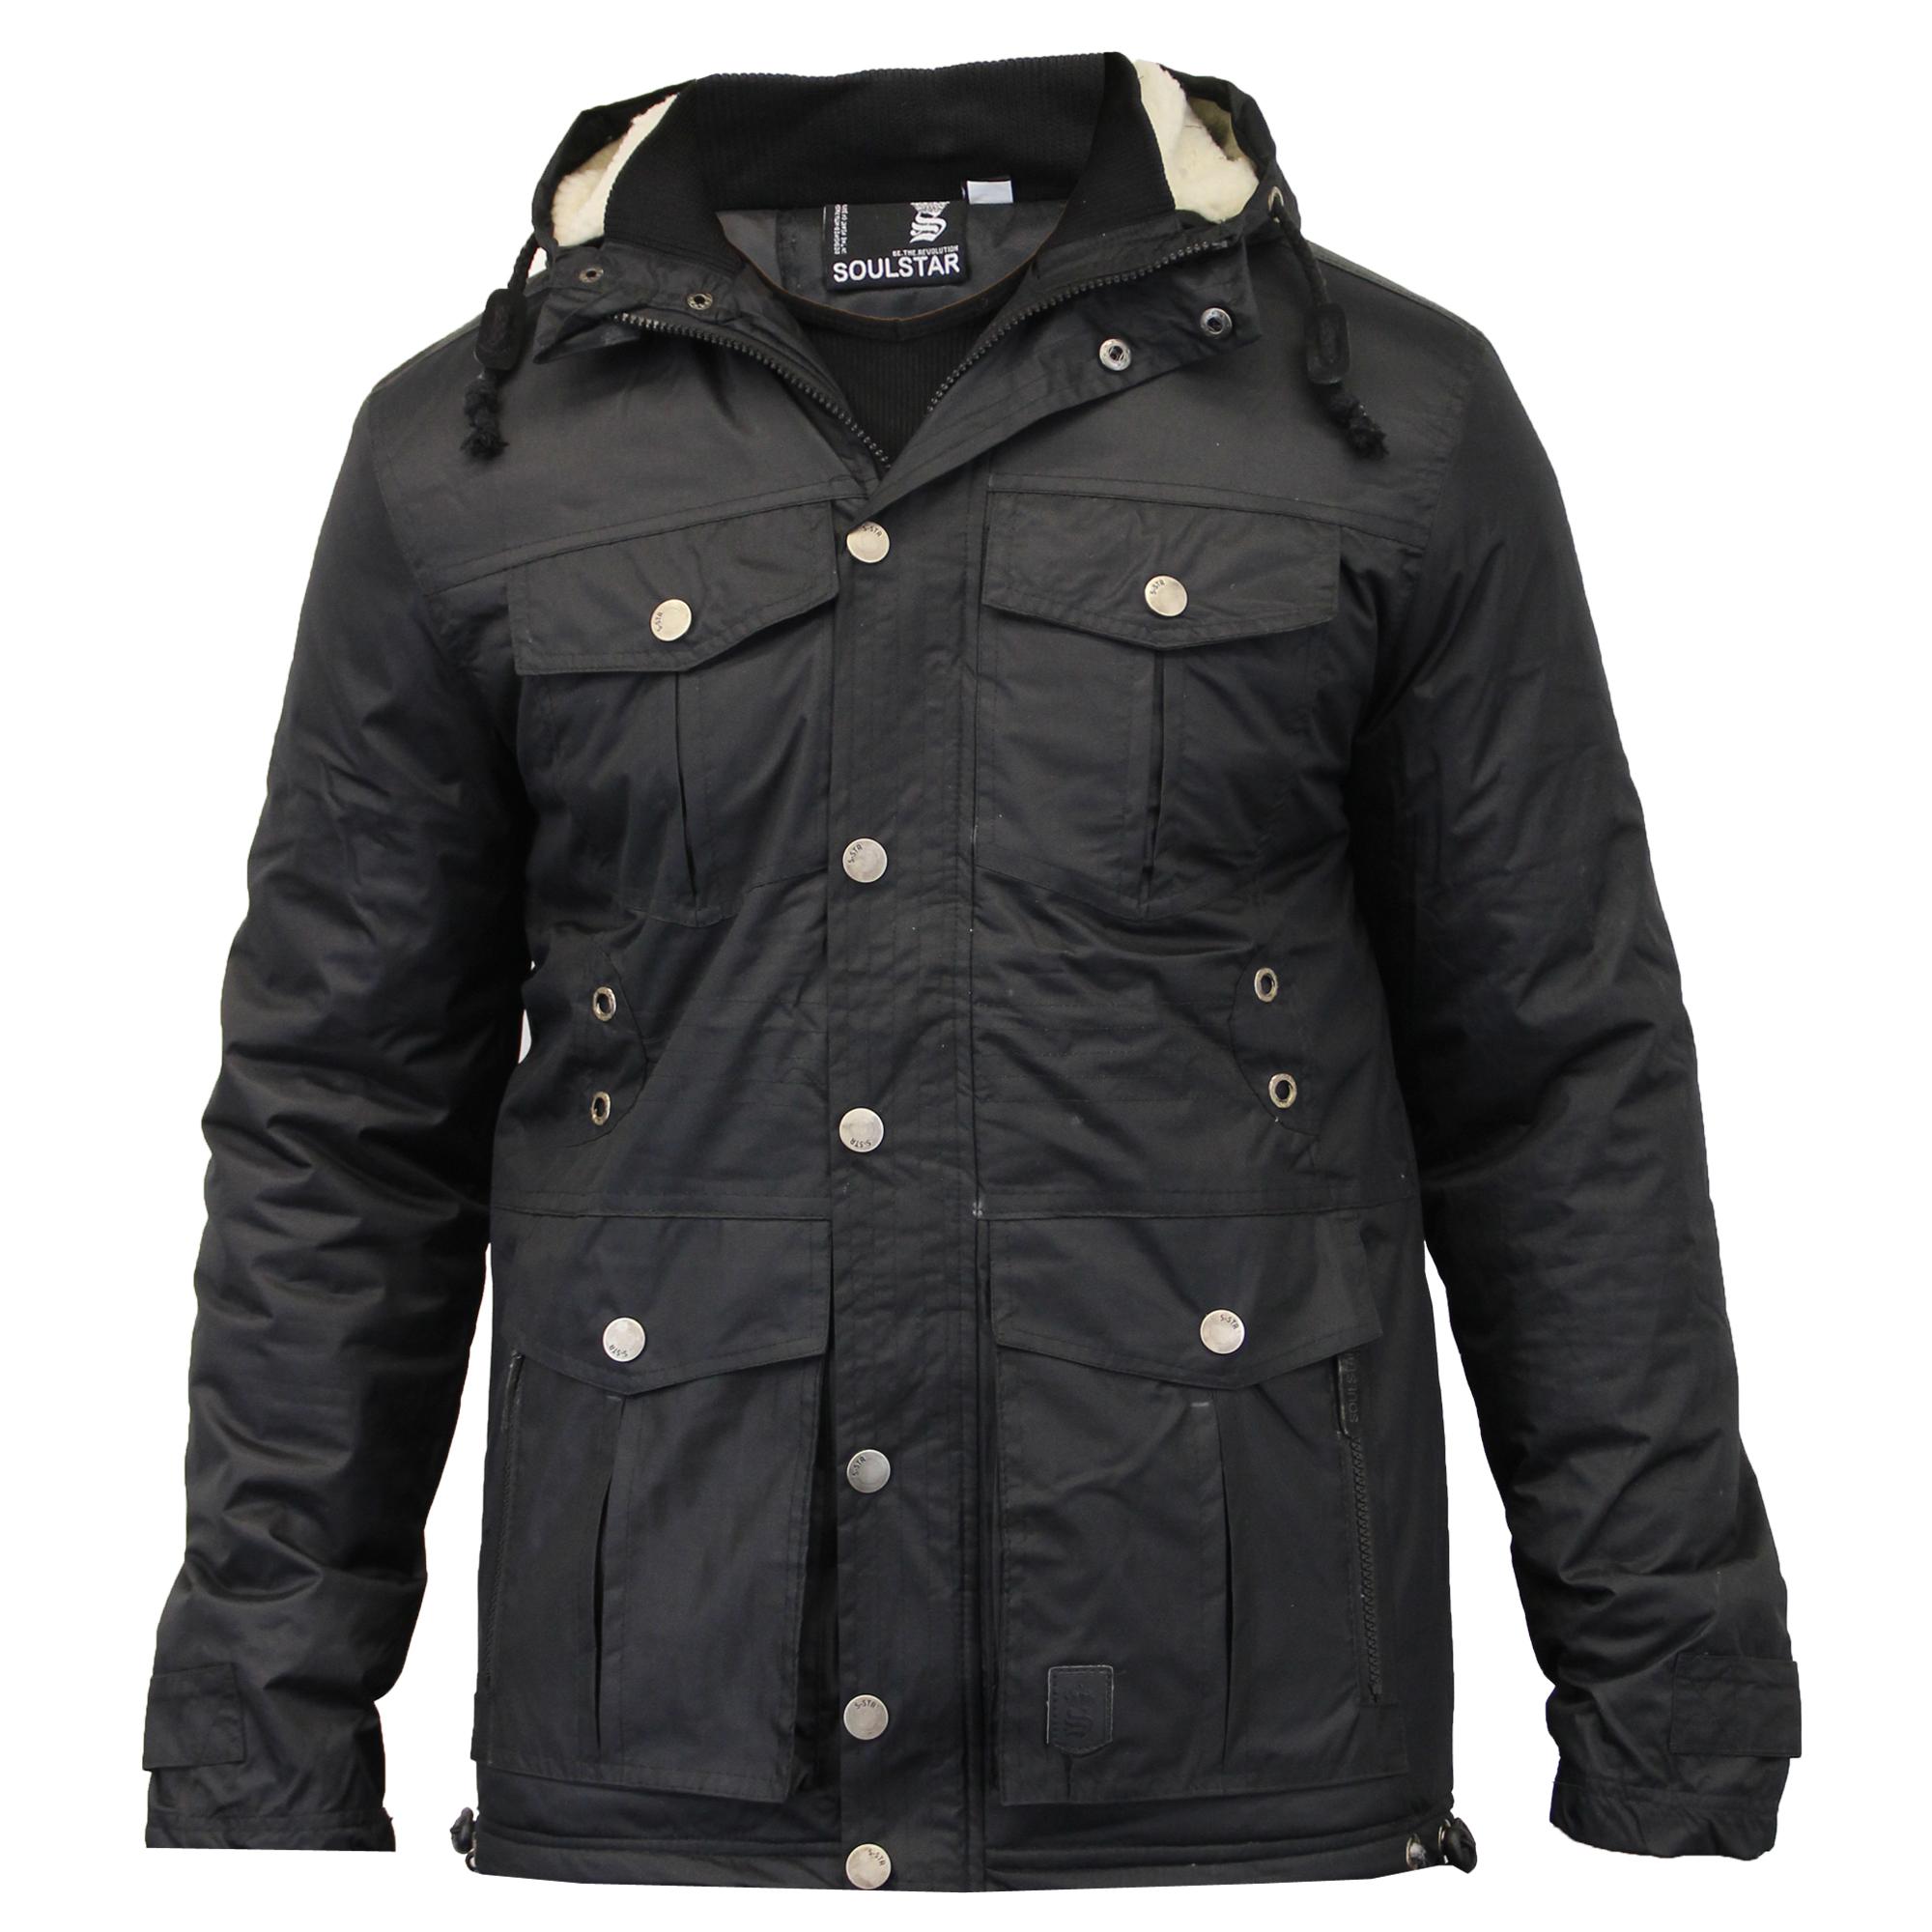 Mens jacket lined with fur - Mens Parka Style Jacket Soul Star Coat Padded